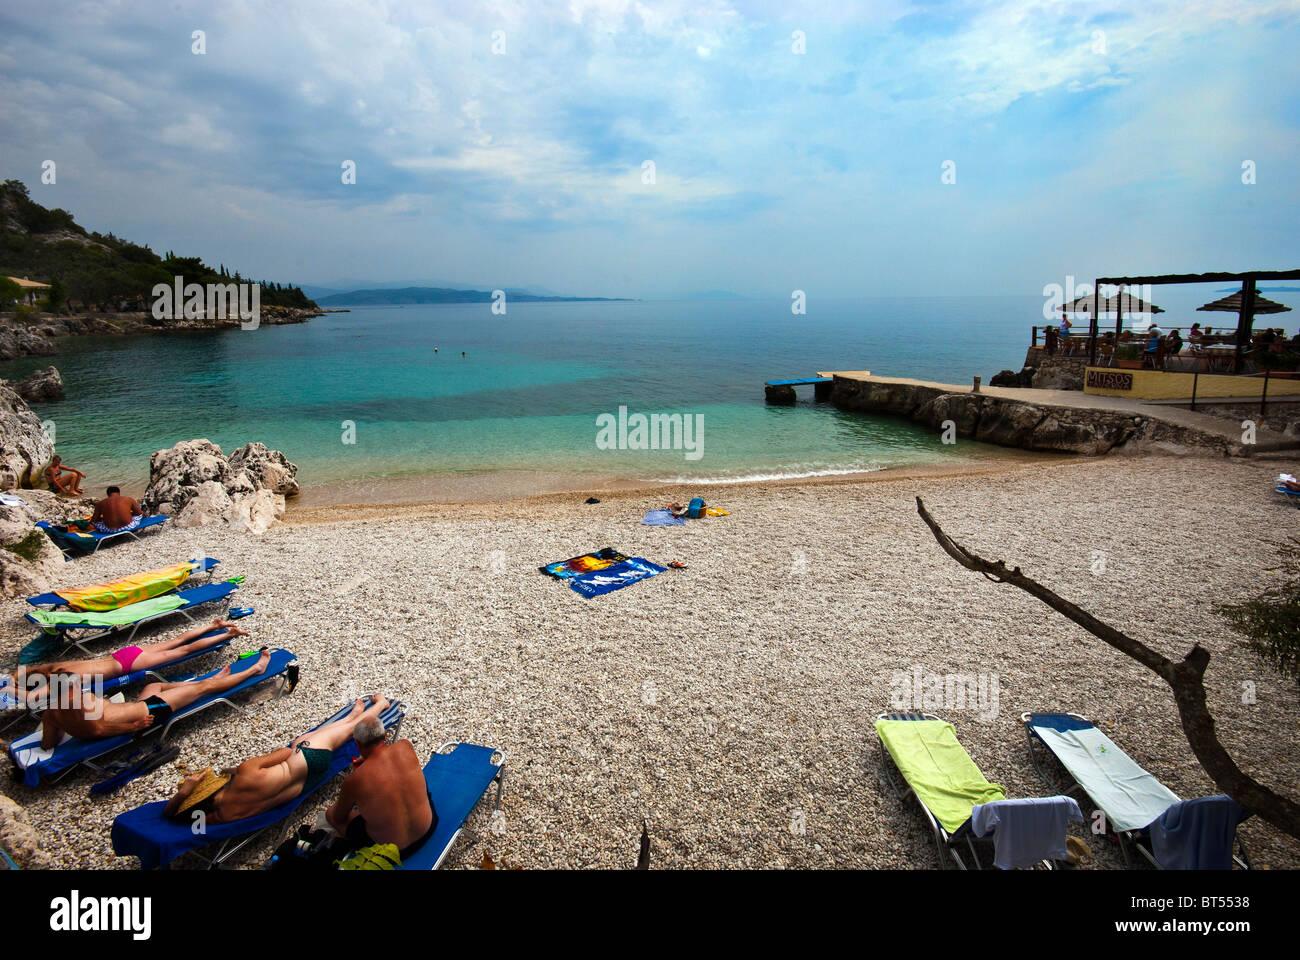 Nisaki Beach, Corfu, Ionian Islands Greece. - Stock Image